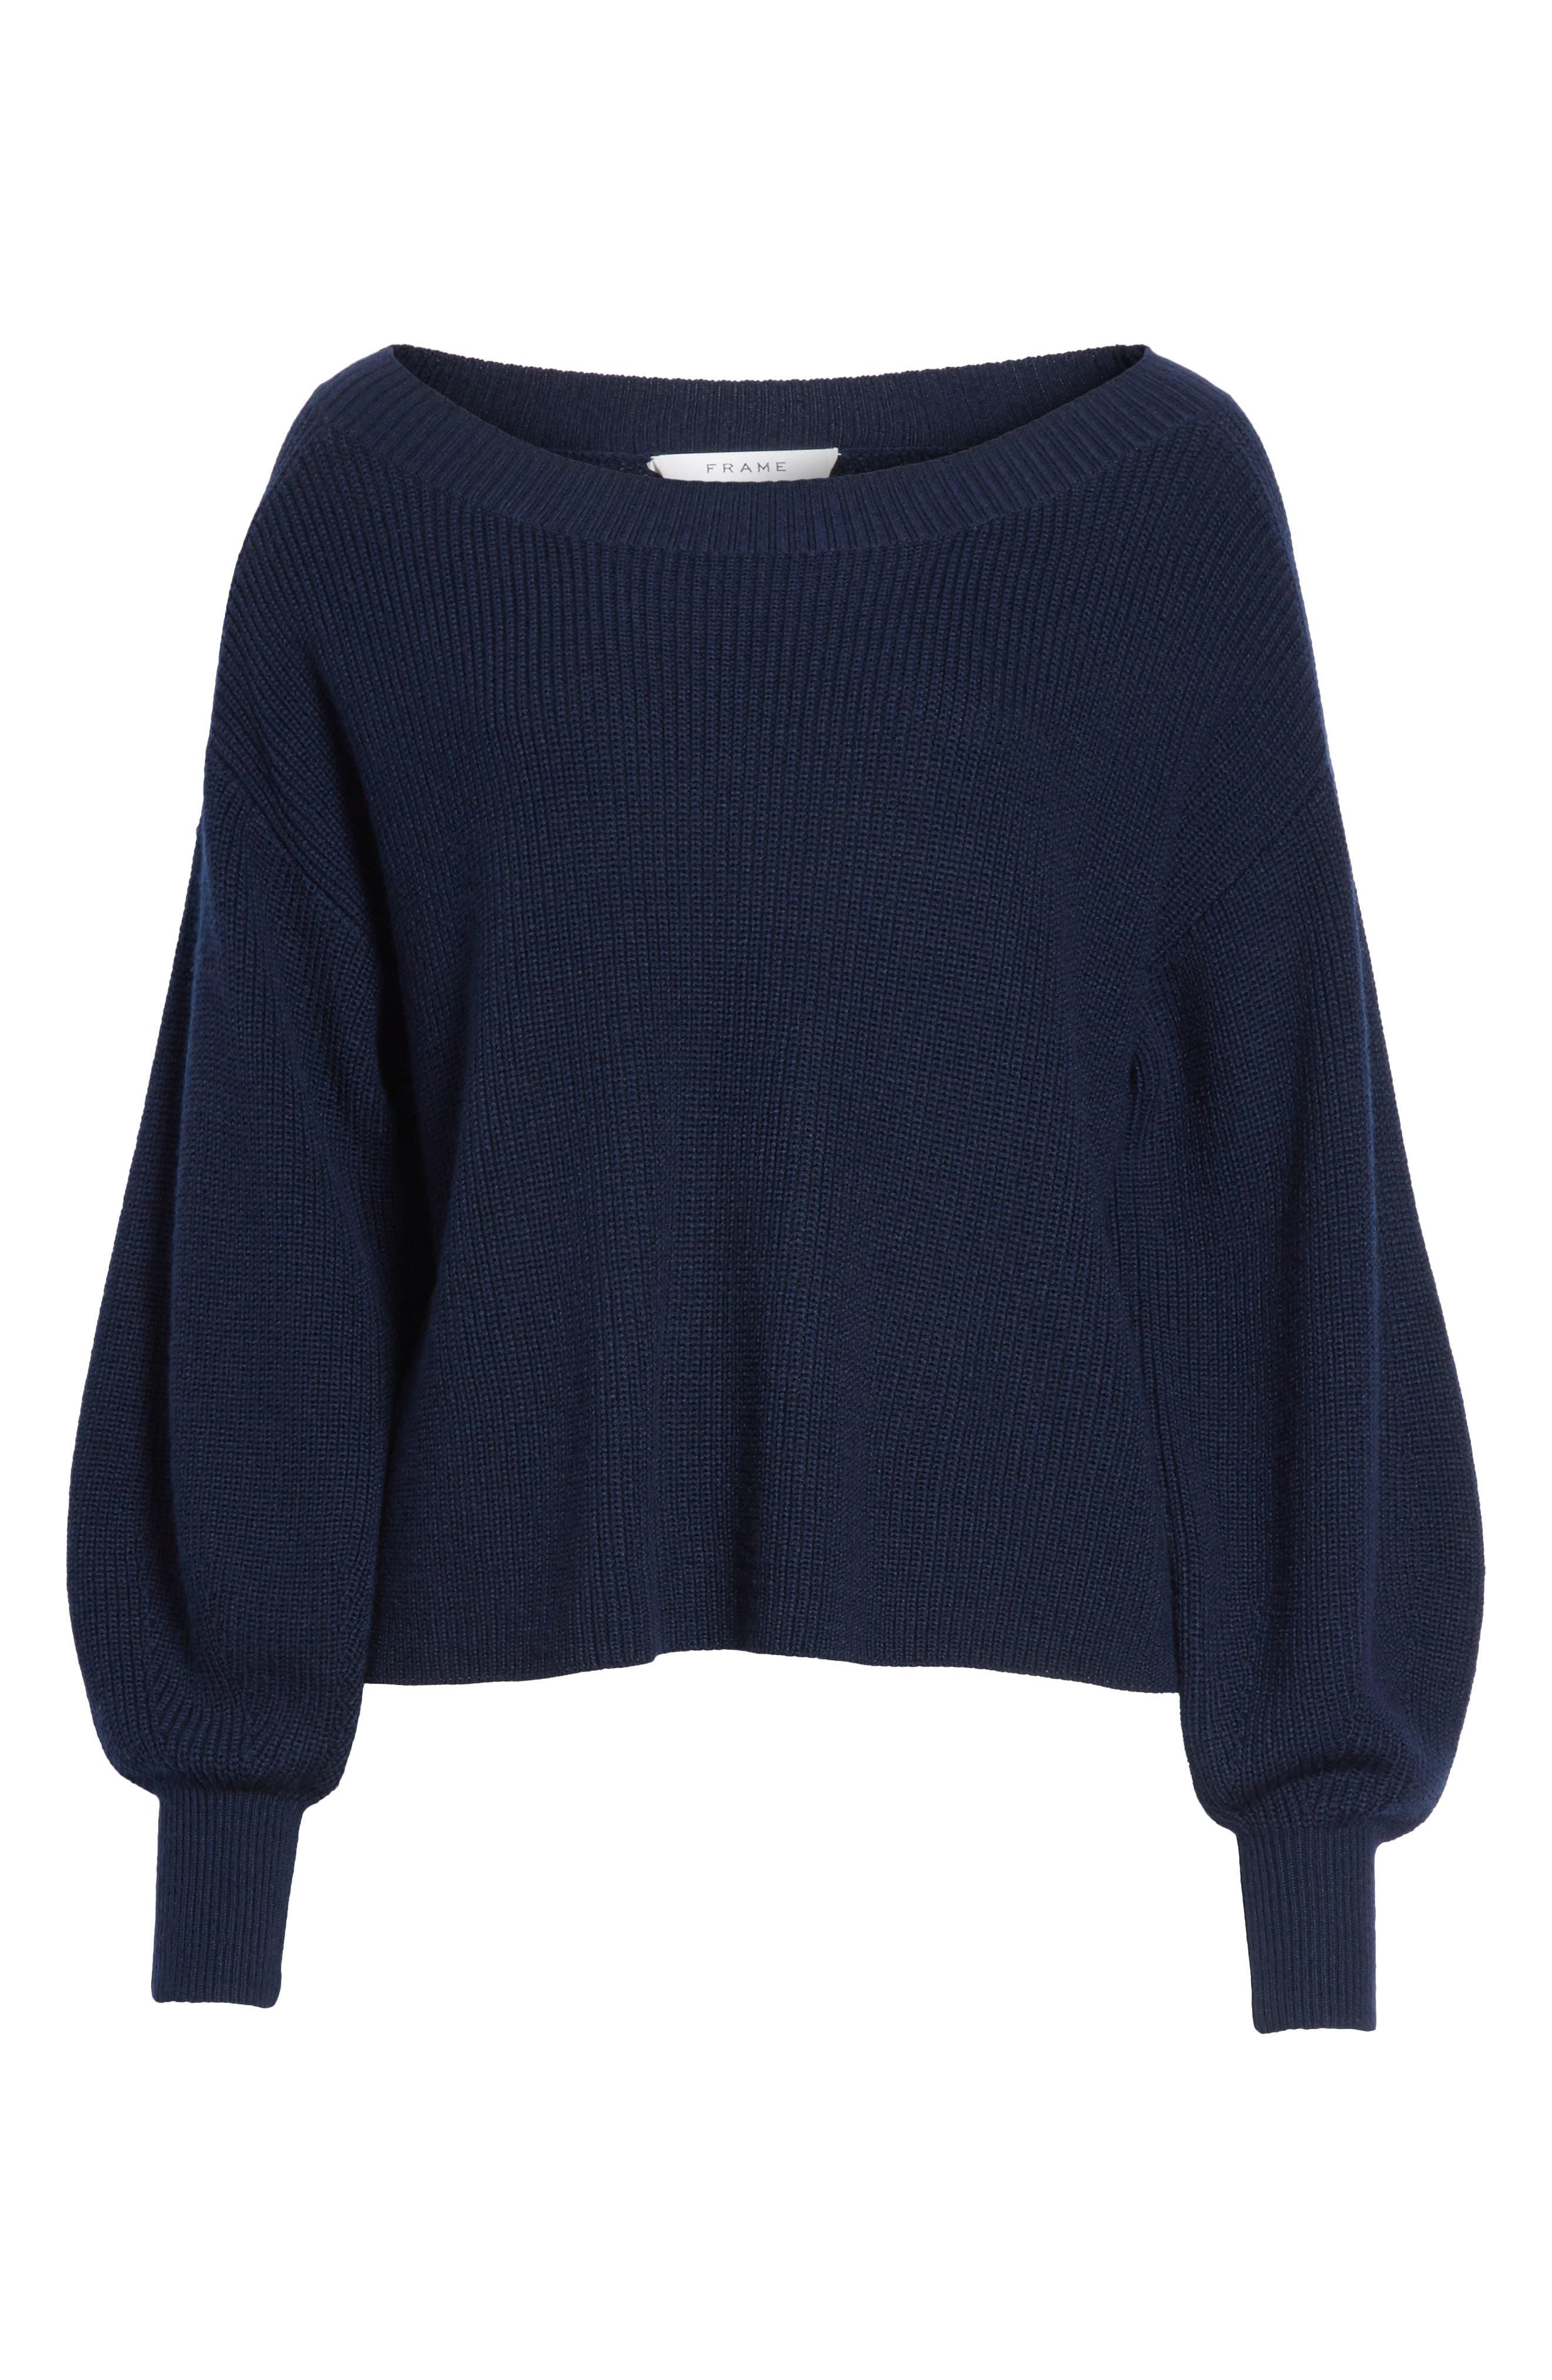 Bateau Neck Merino Wool Blend Sweater,                             Alternate thumbnail 6, color,                             410